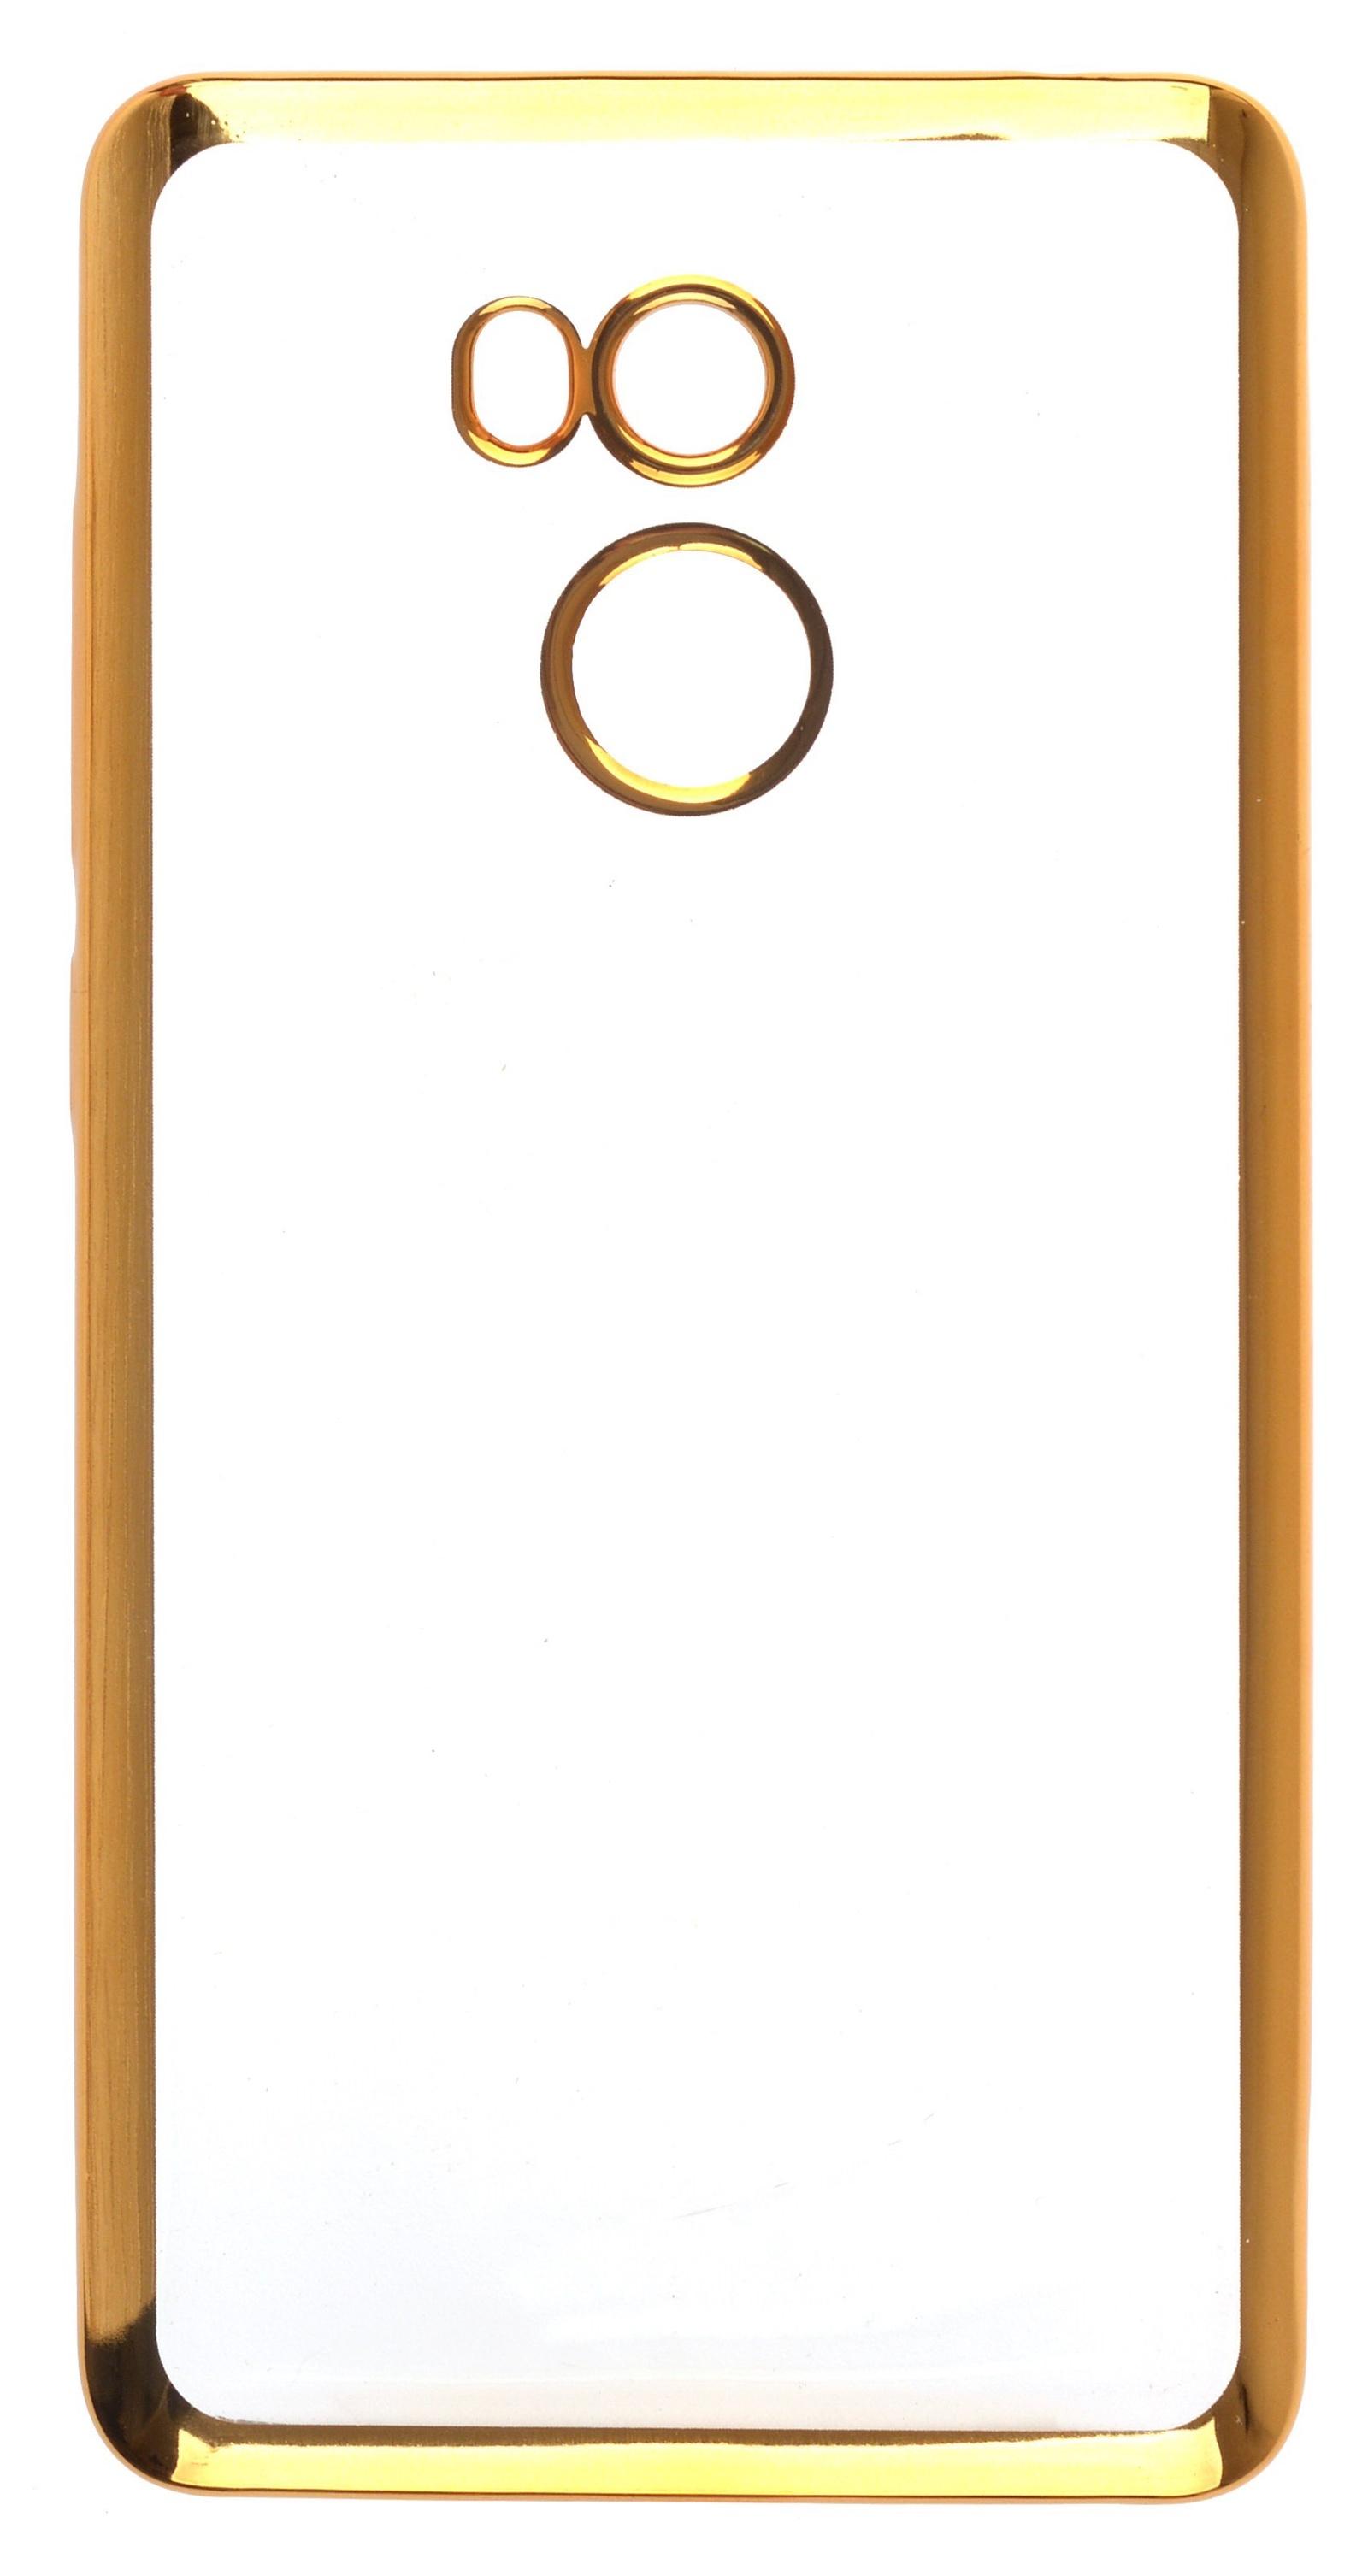 Чехол для сотового телефона skinBOX Silicone chrome border, 4630042529427, золотой аксессуар чехол накладка innovation silicone 0 33mm для apple iphone 5 5s transparent 12001